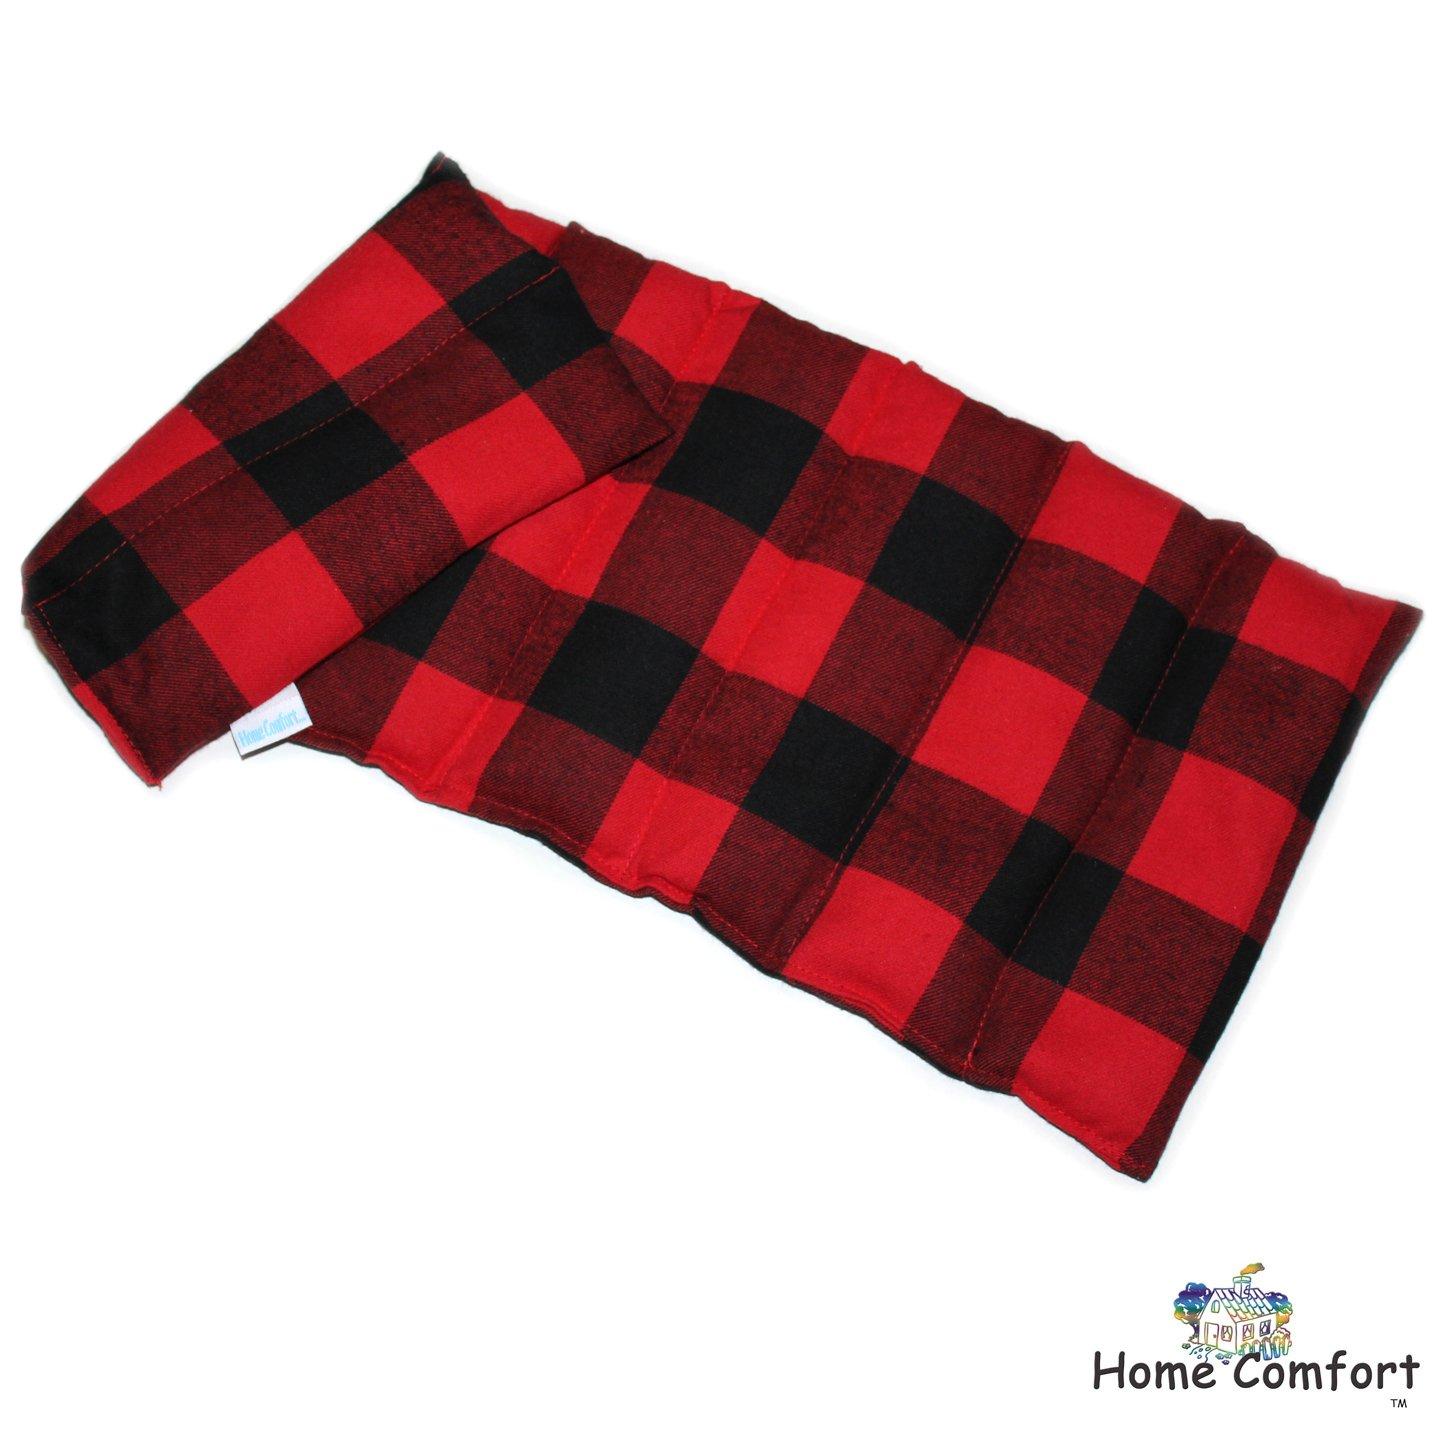 Microwavable Heating Pad (Red Plaid)